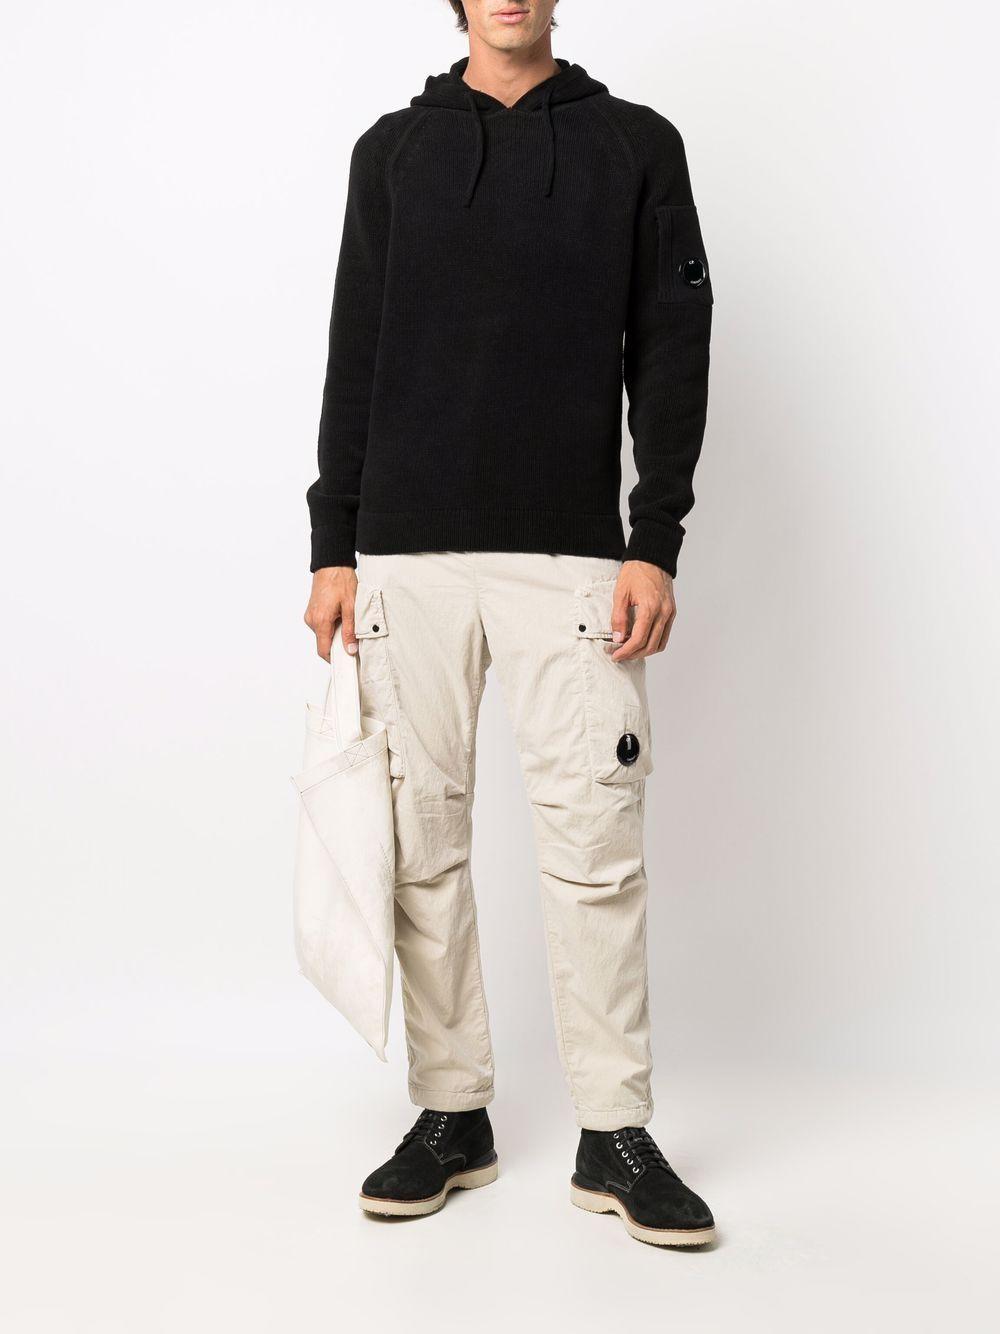 C.P. COMPANY   Sweatshirts   11CMKN100A005558G999